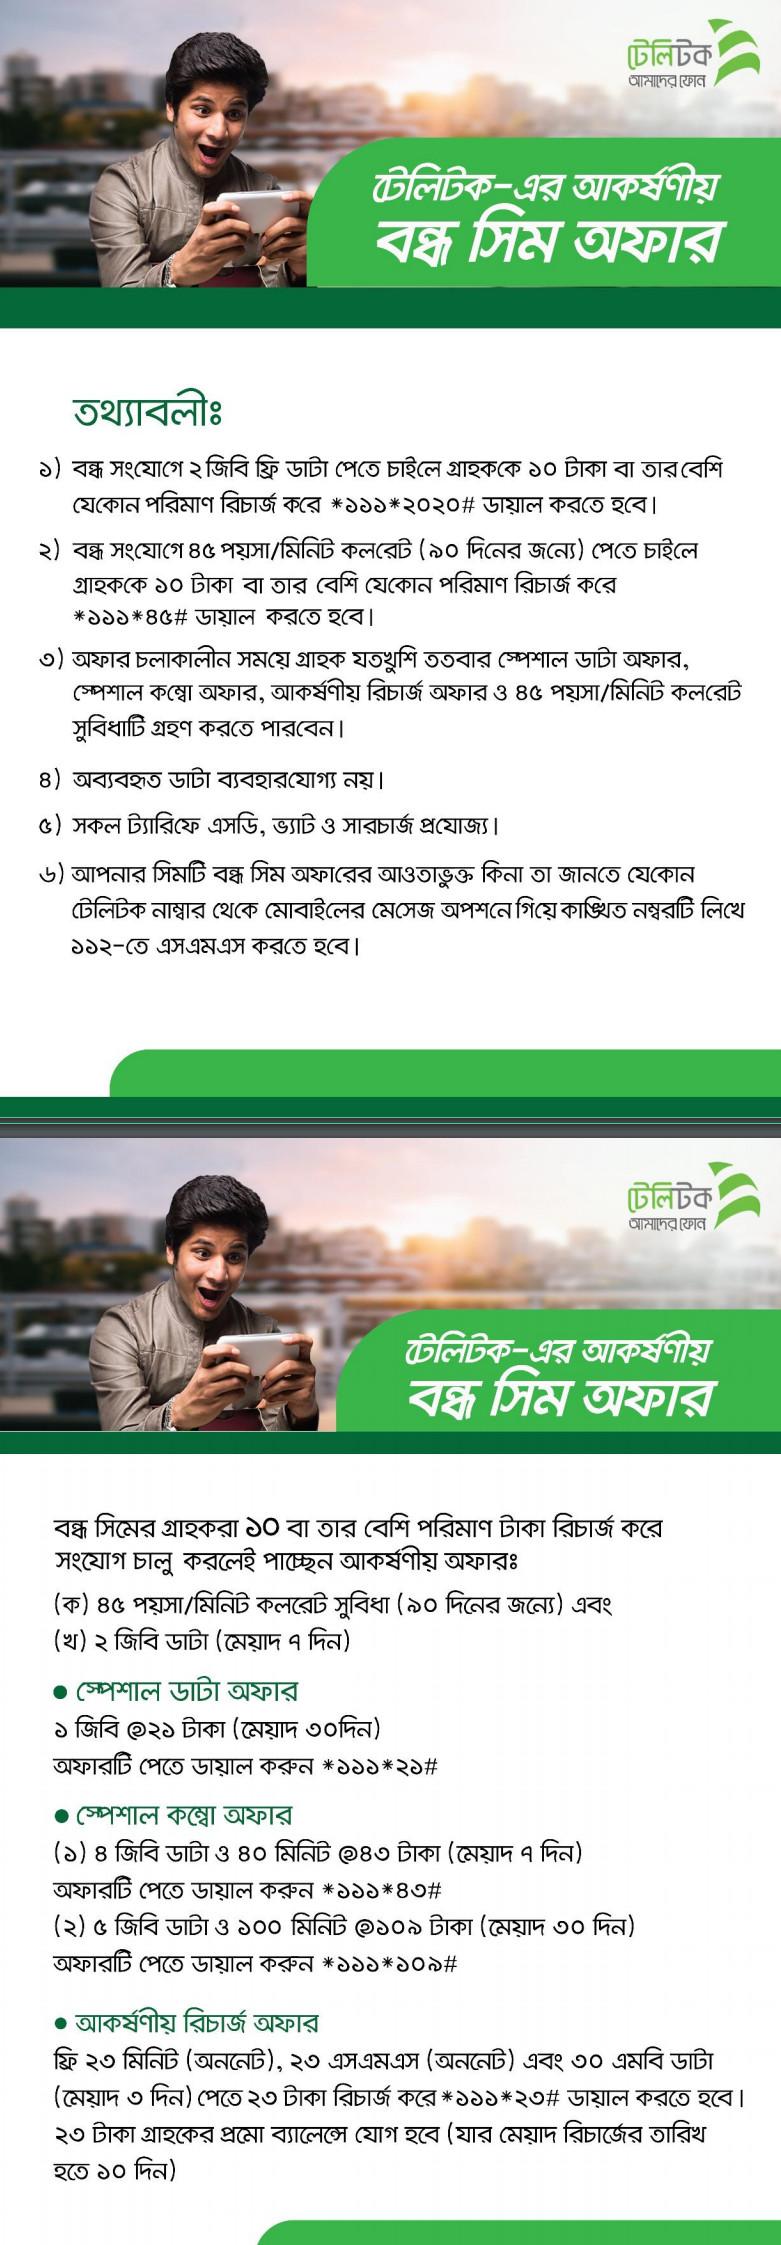 Teletalk Bondho SIM Offer 2021